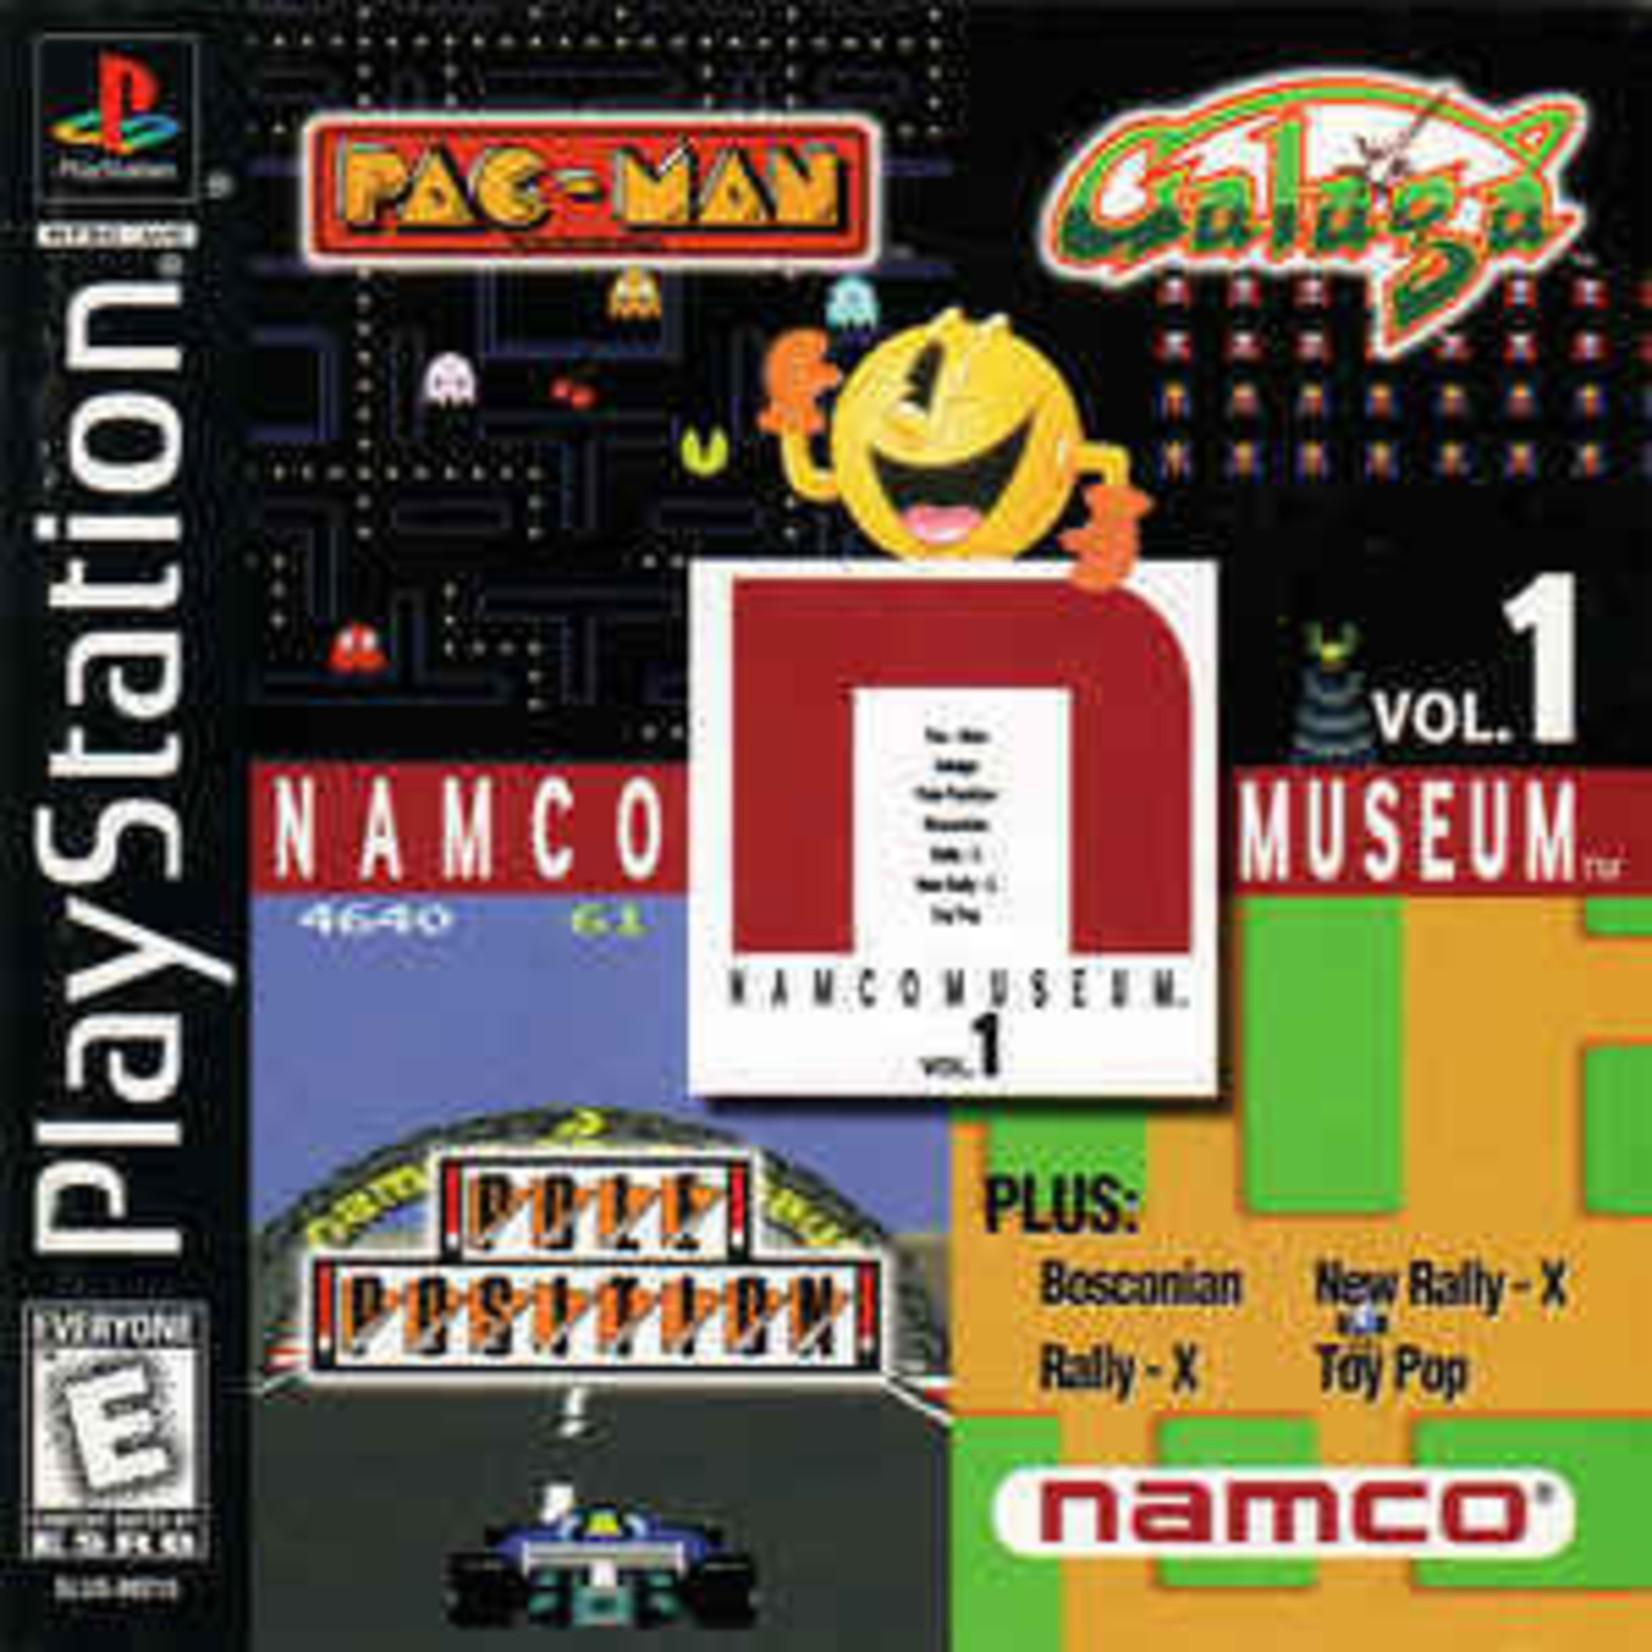 ps1u-Namco Museum Volume 1